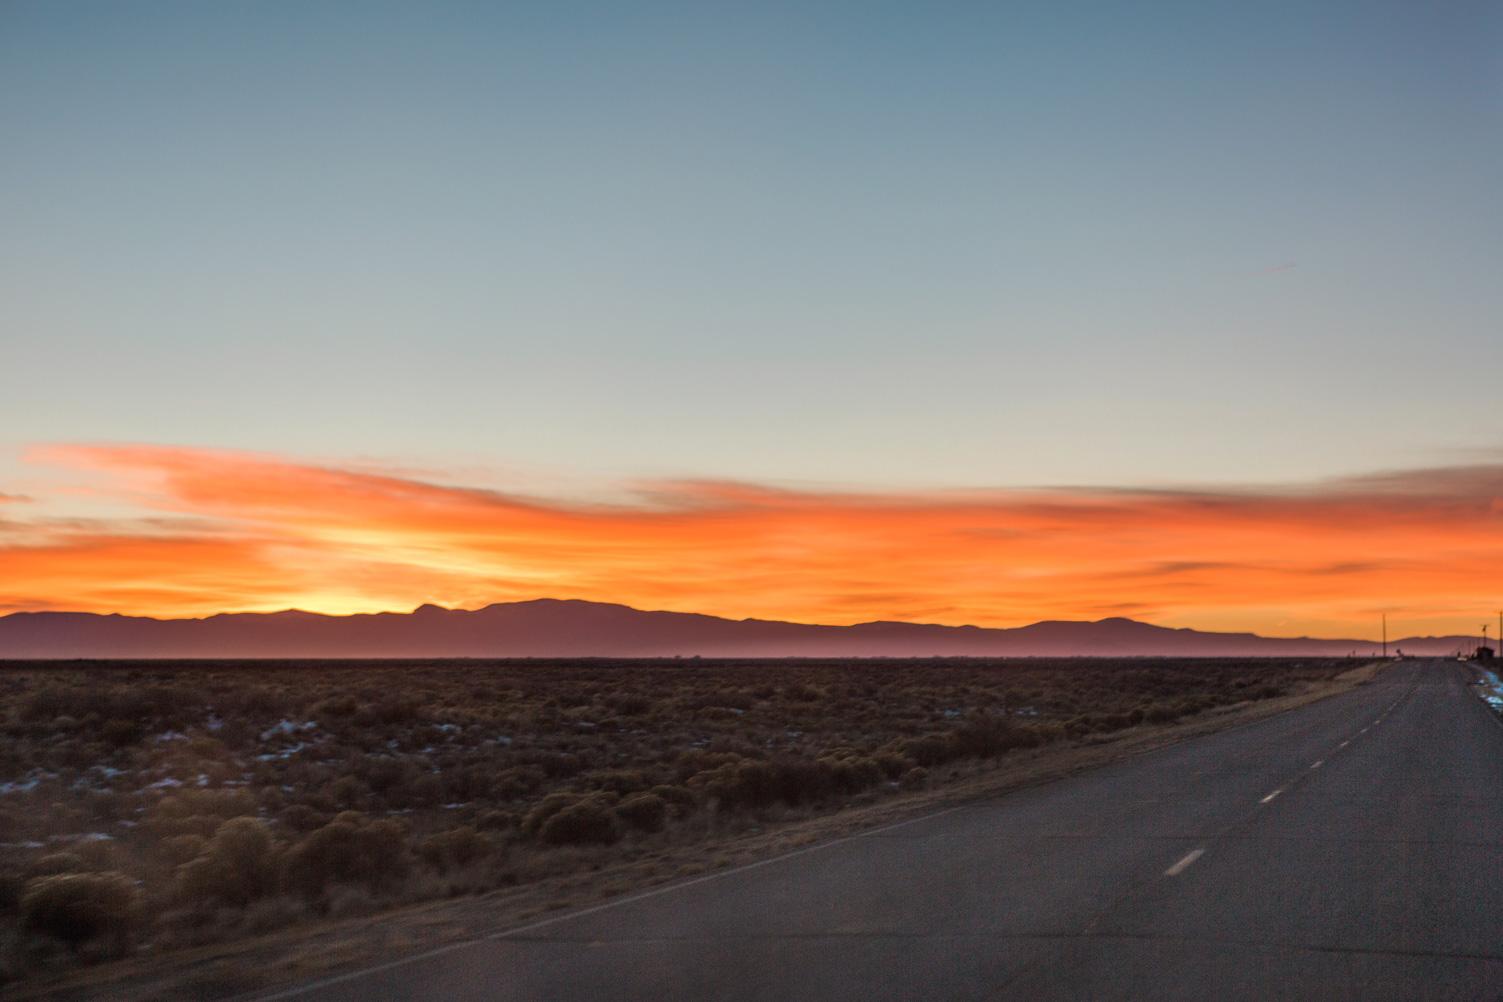 CindyGiovagnoli_Great_Sand_Dunes_National_Park_NPS_Colorado_roadtrip-020.jpg